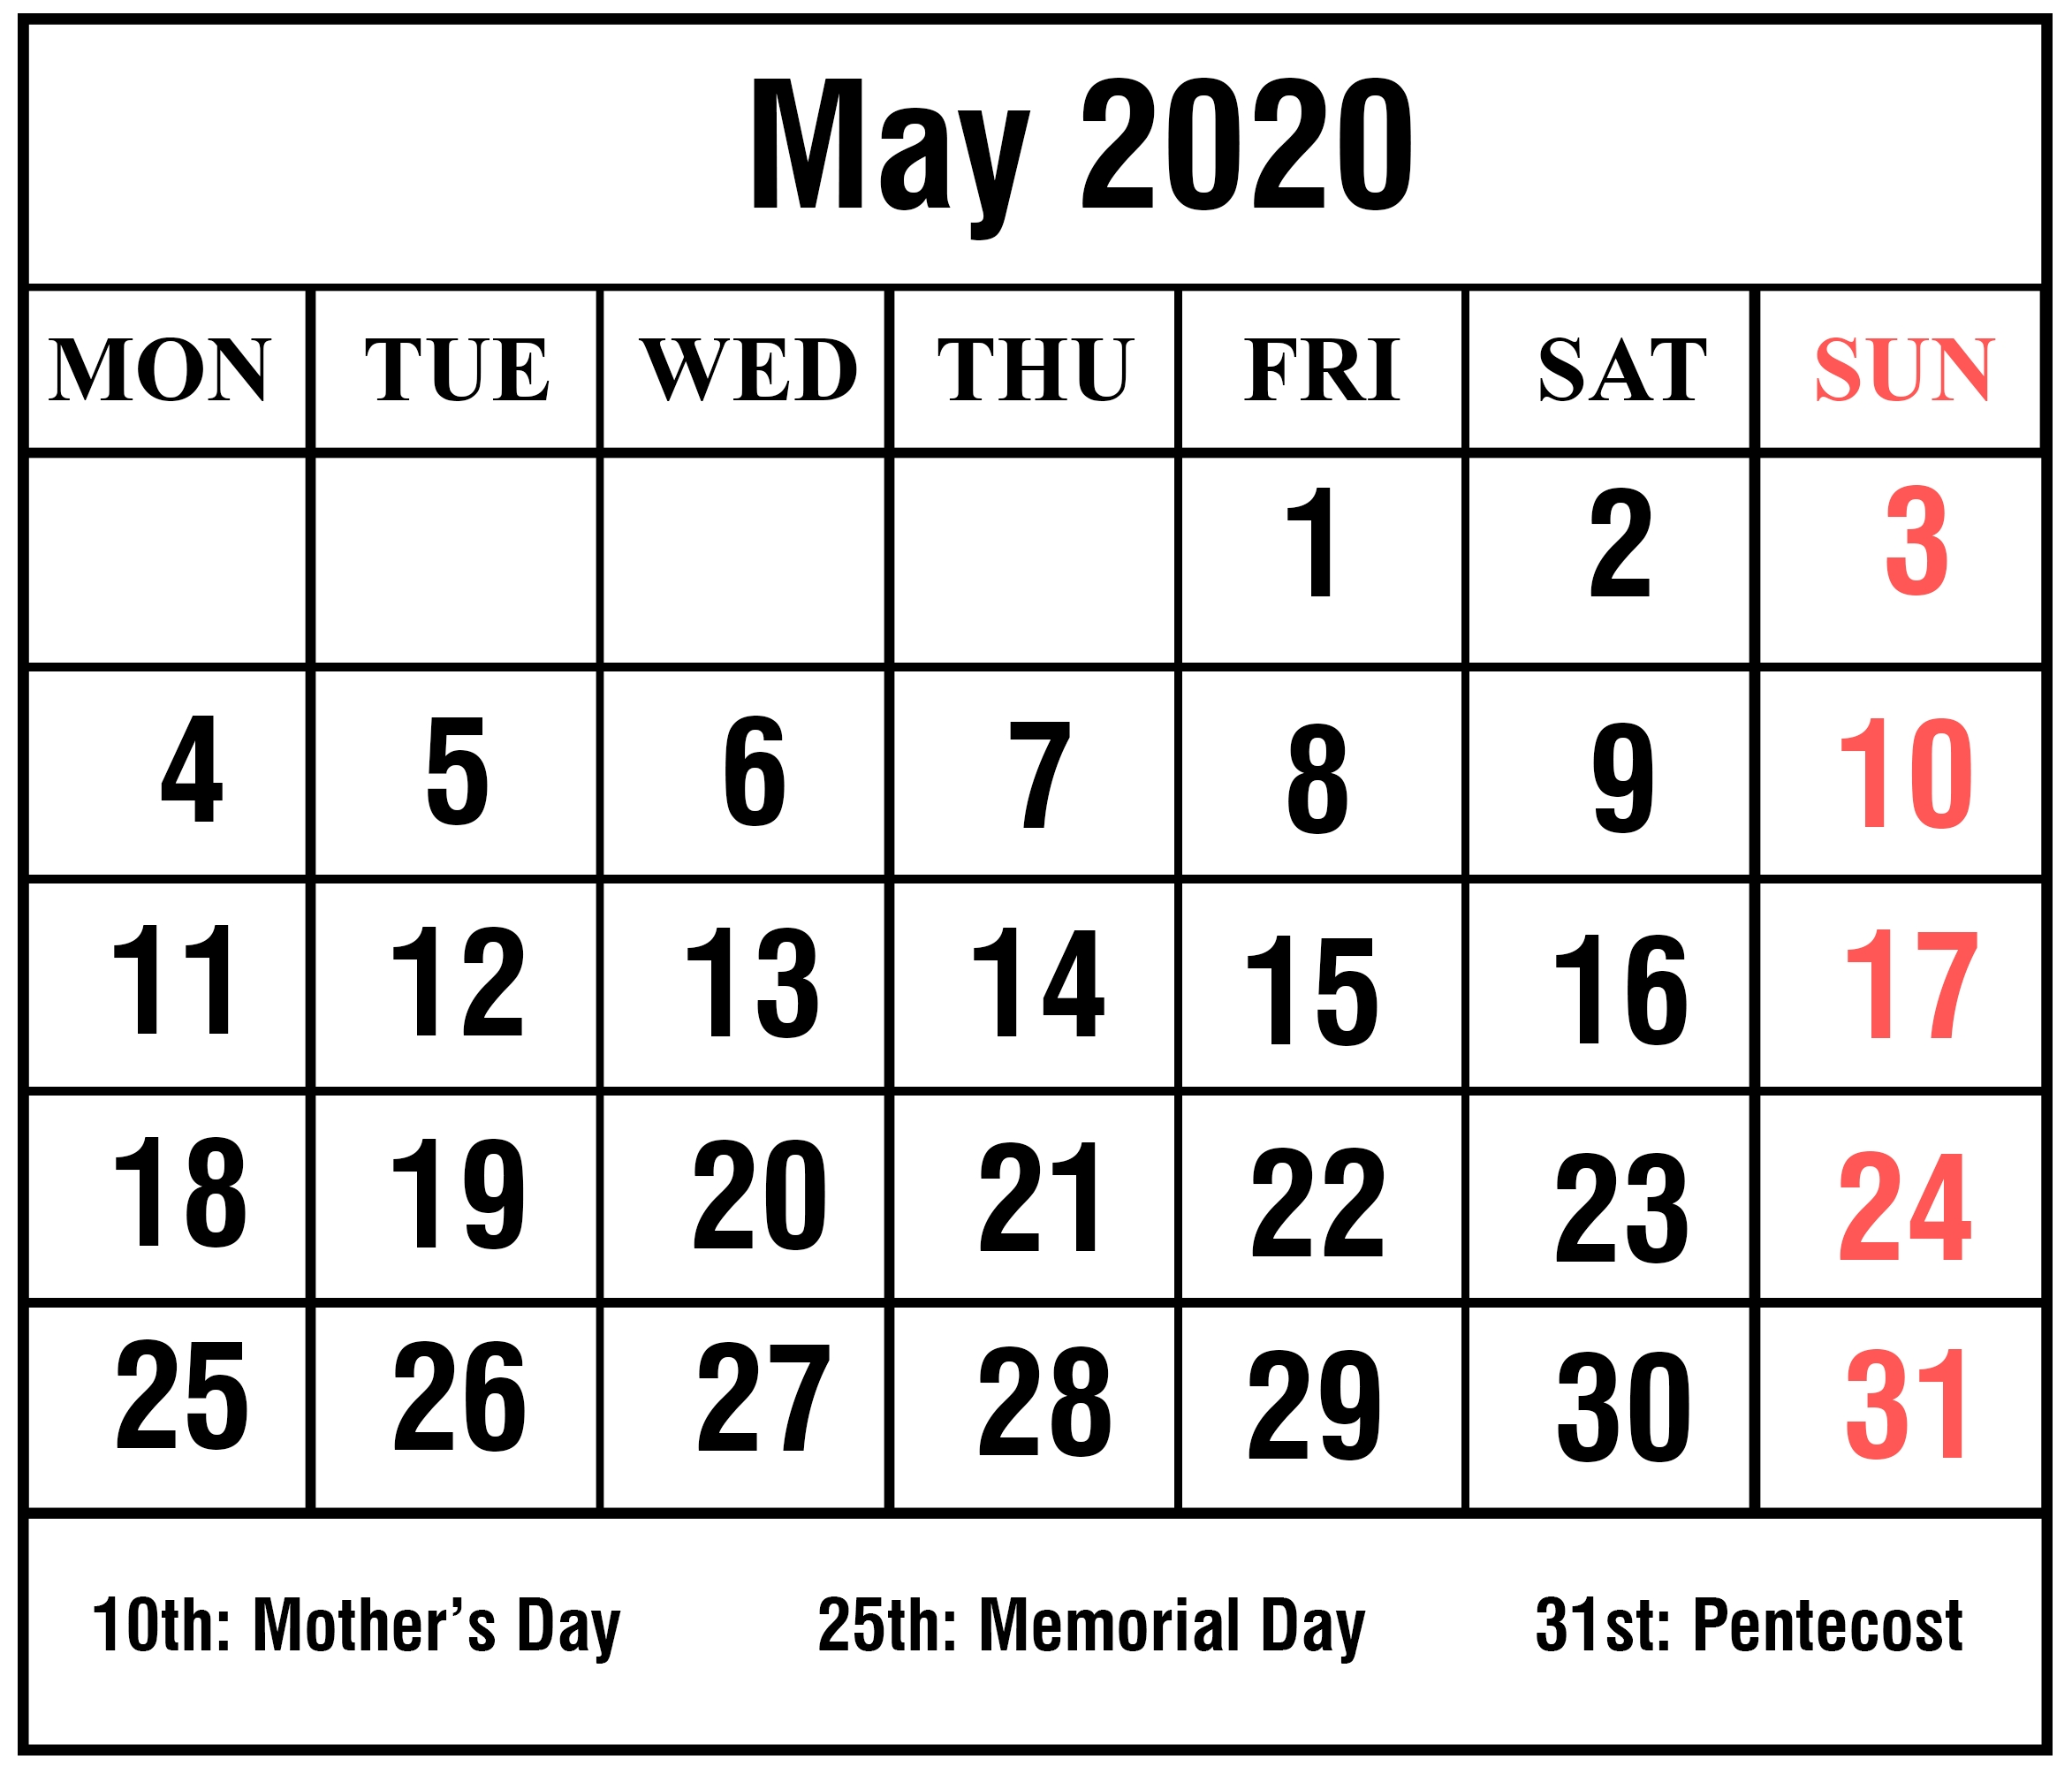 Editable May 2020 Calendar To Print Pdf Word Blank Blank